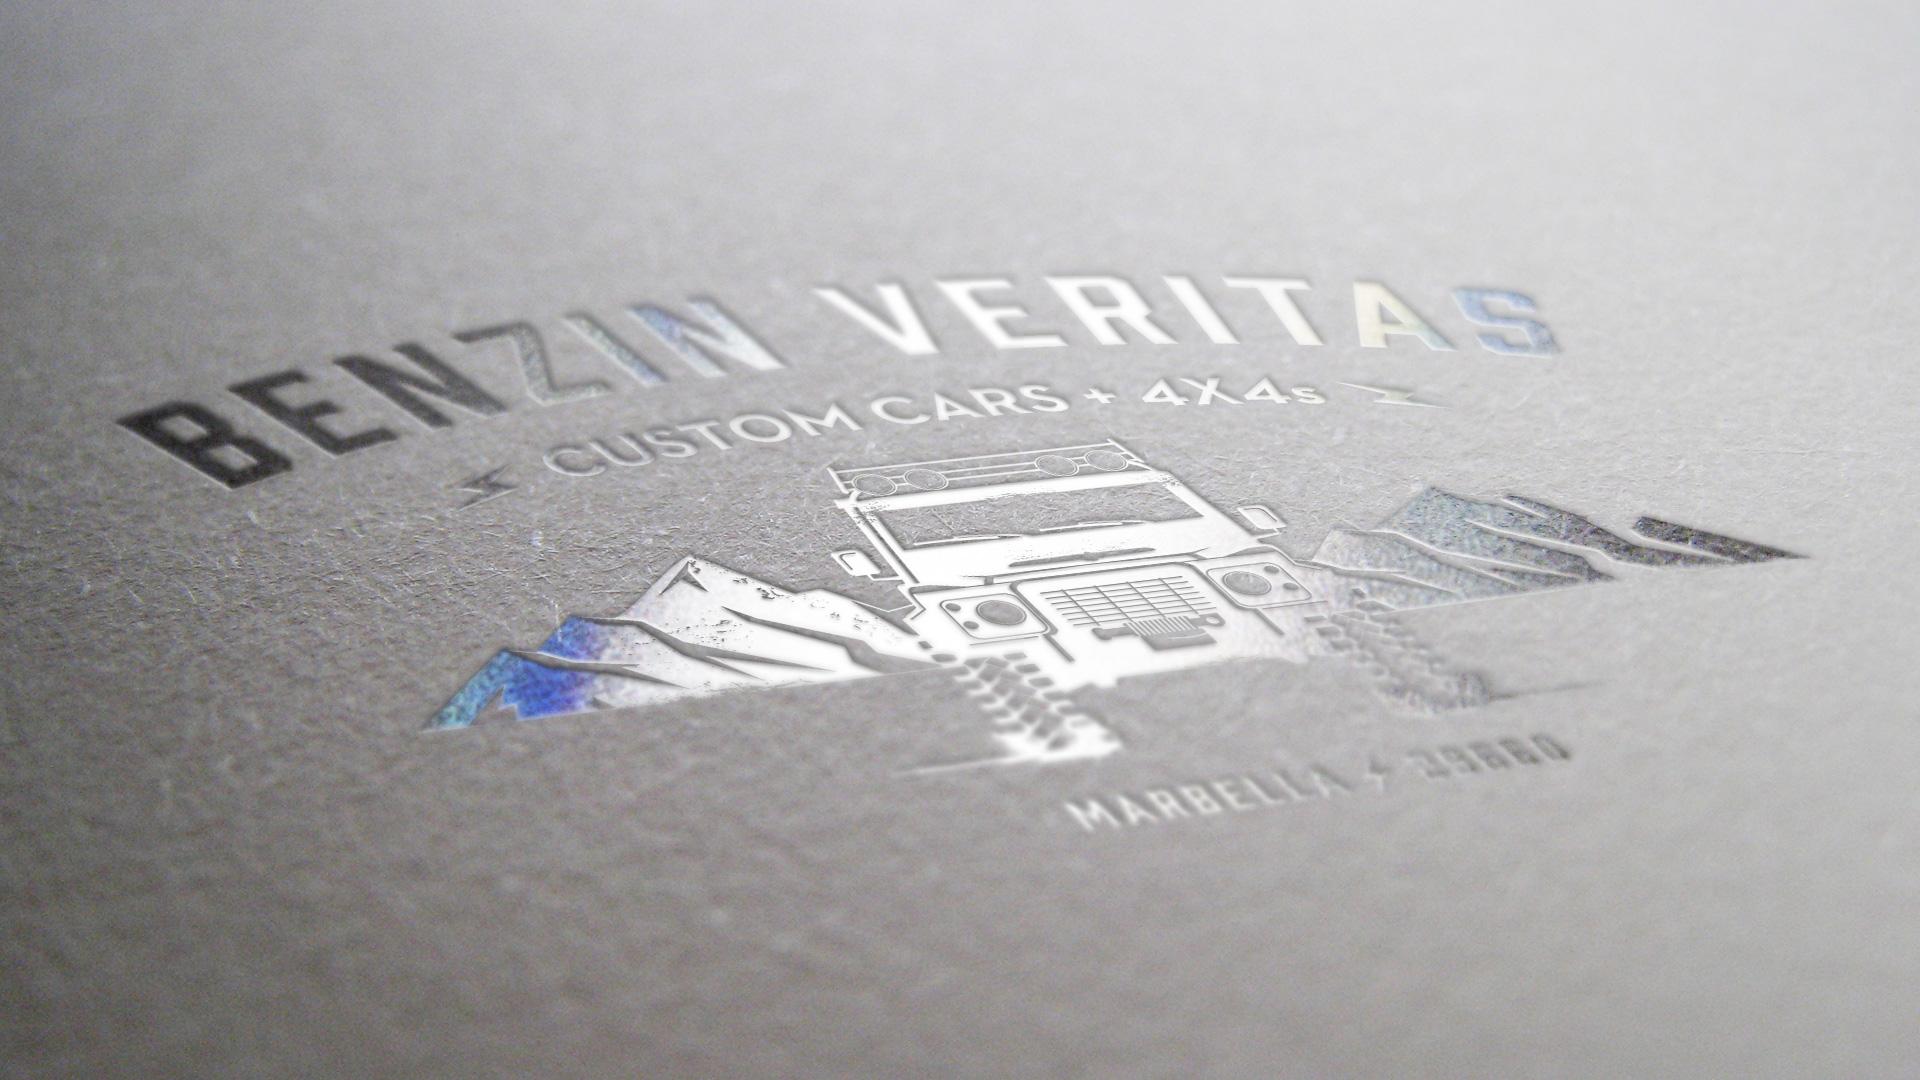 benzin-veritas-logos03c.jpg